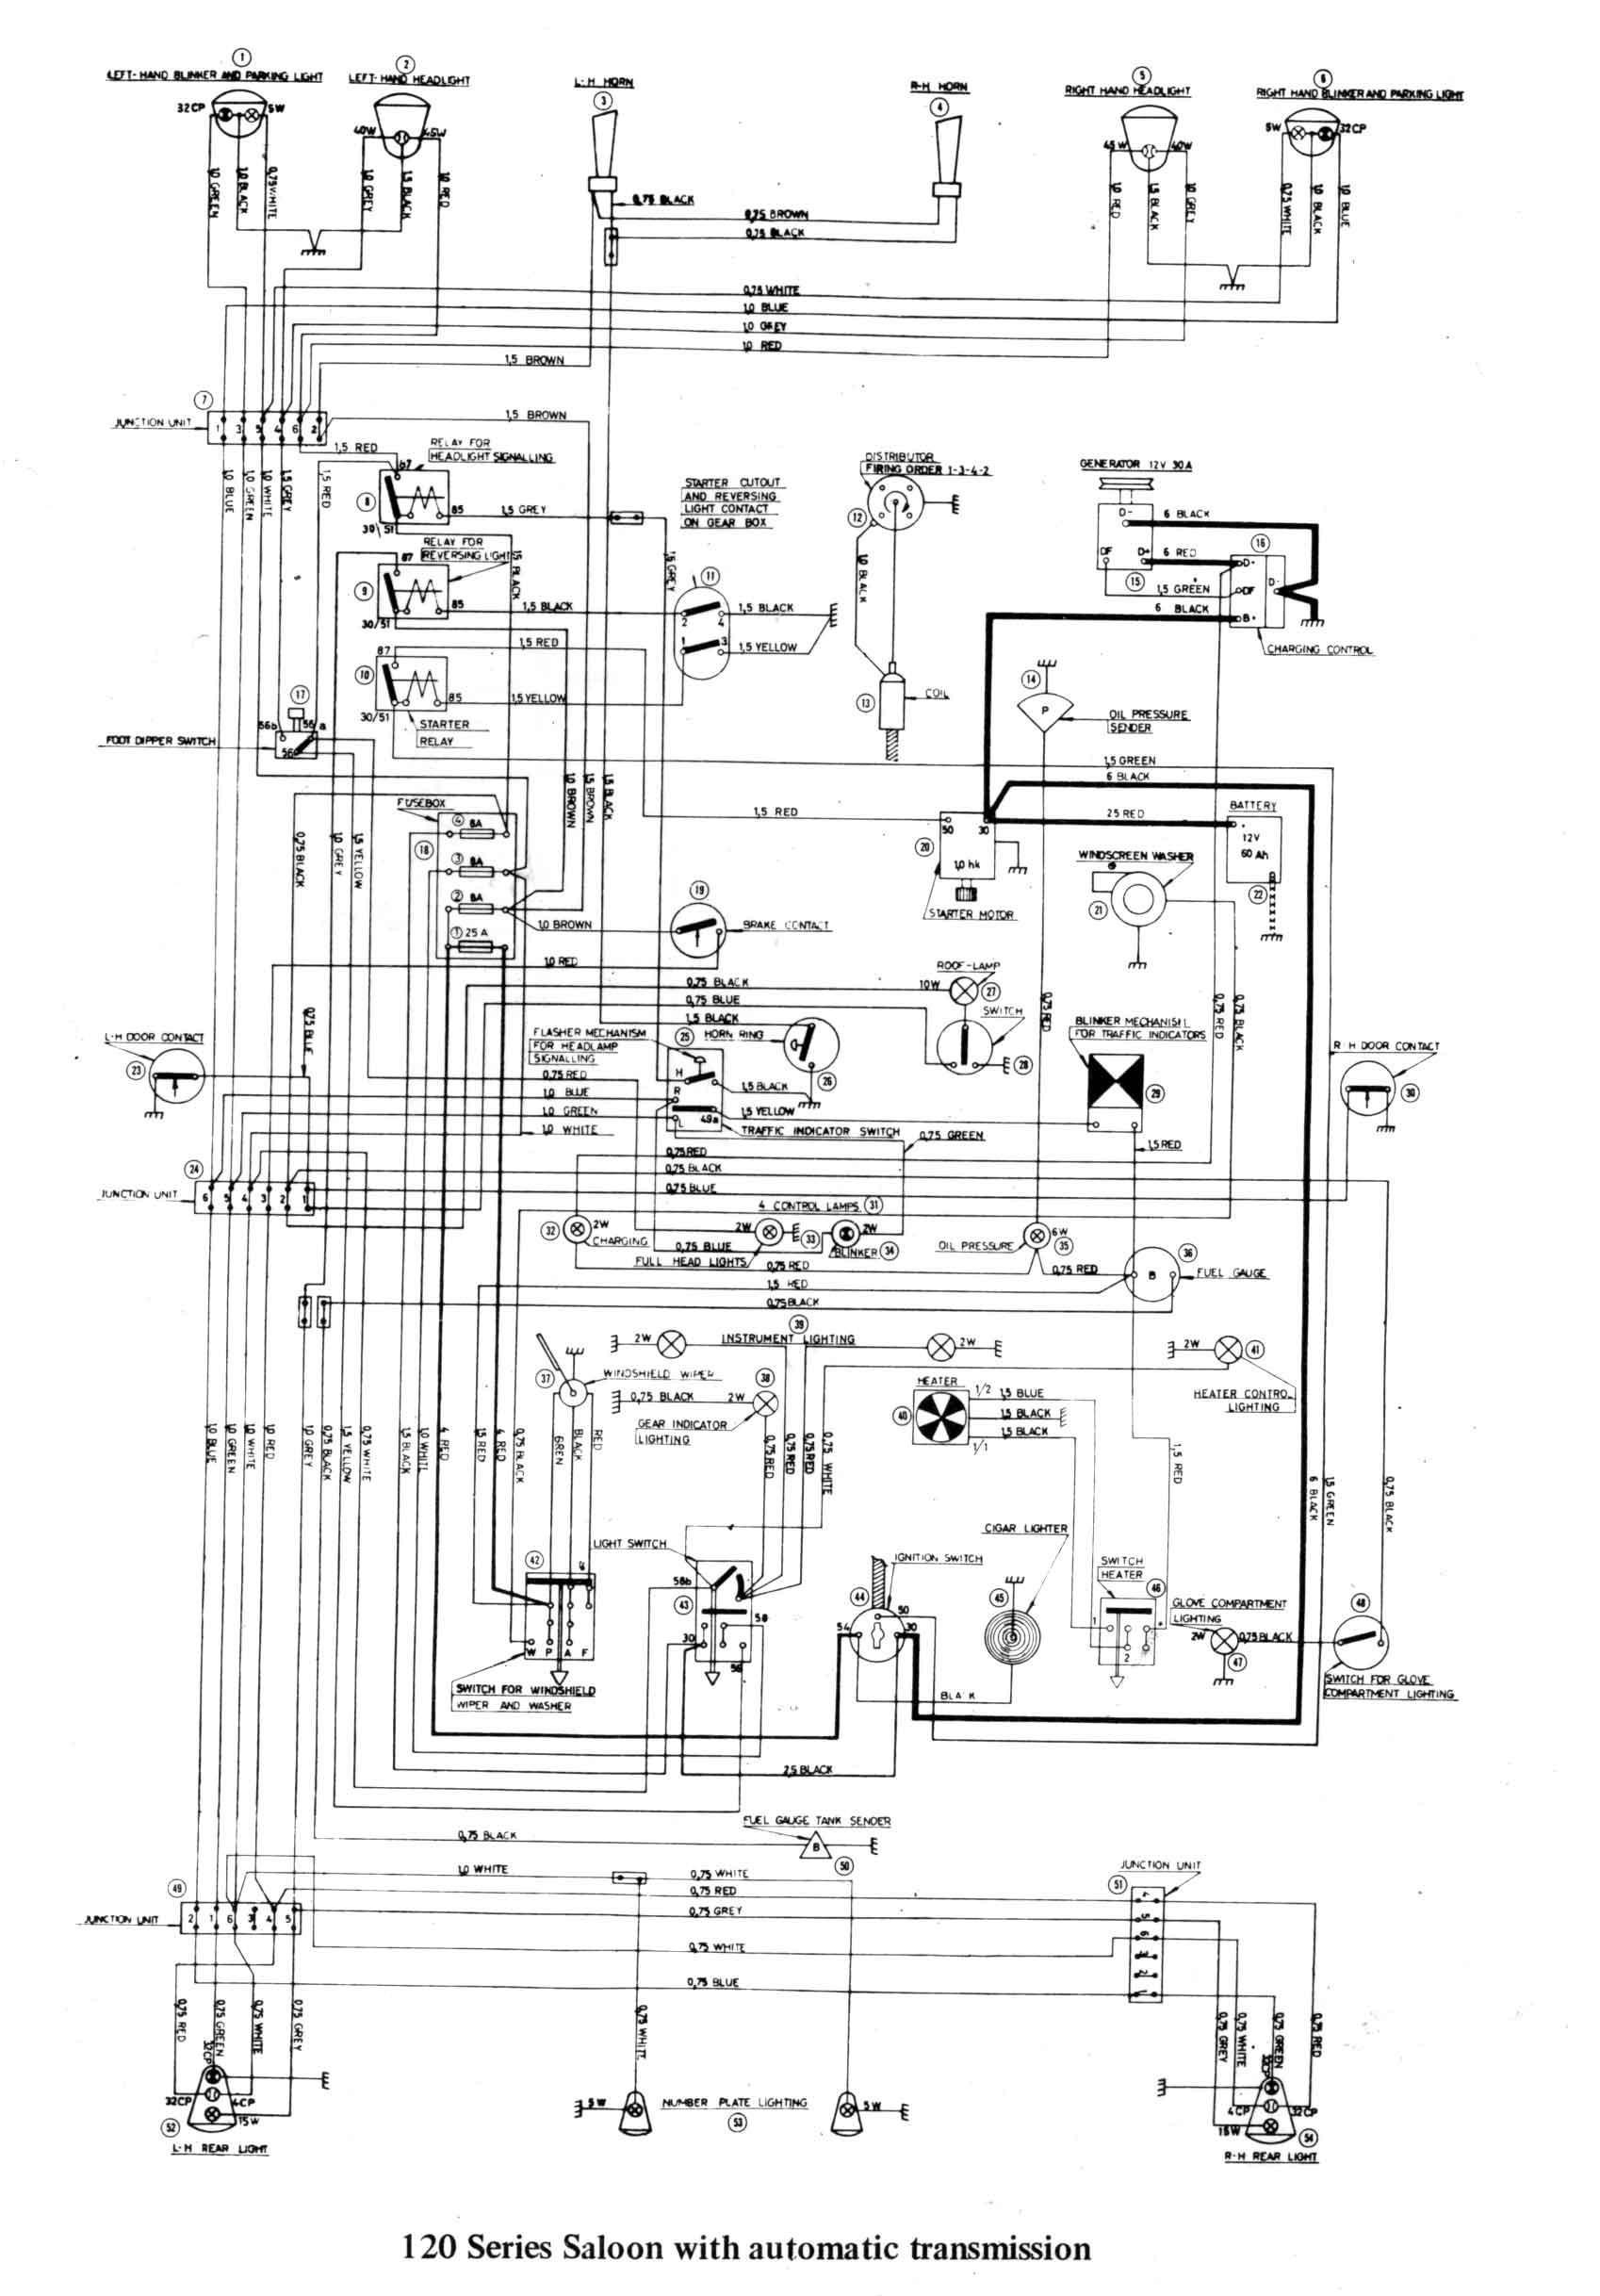 Wiring Diagram for ford Starter Relay Best Wiring Diagram for Car Starter New Engine Starter Diagram